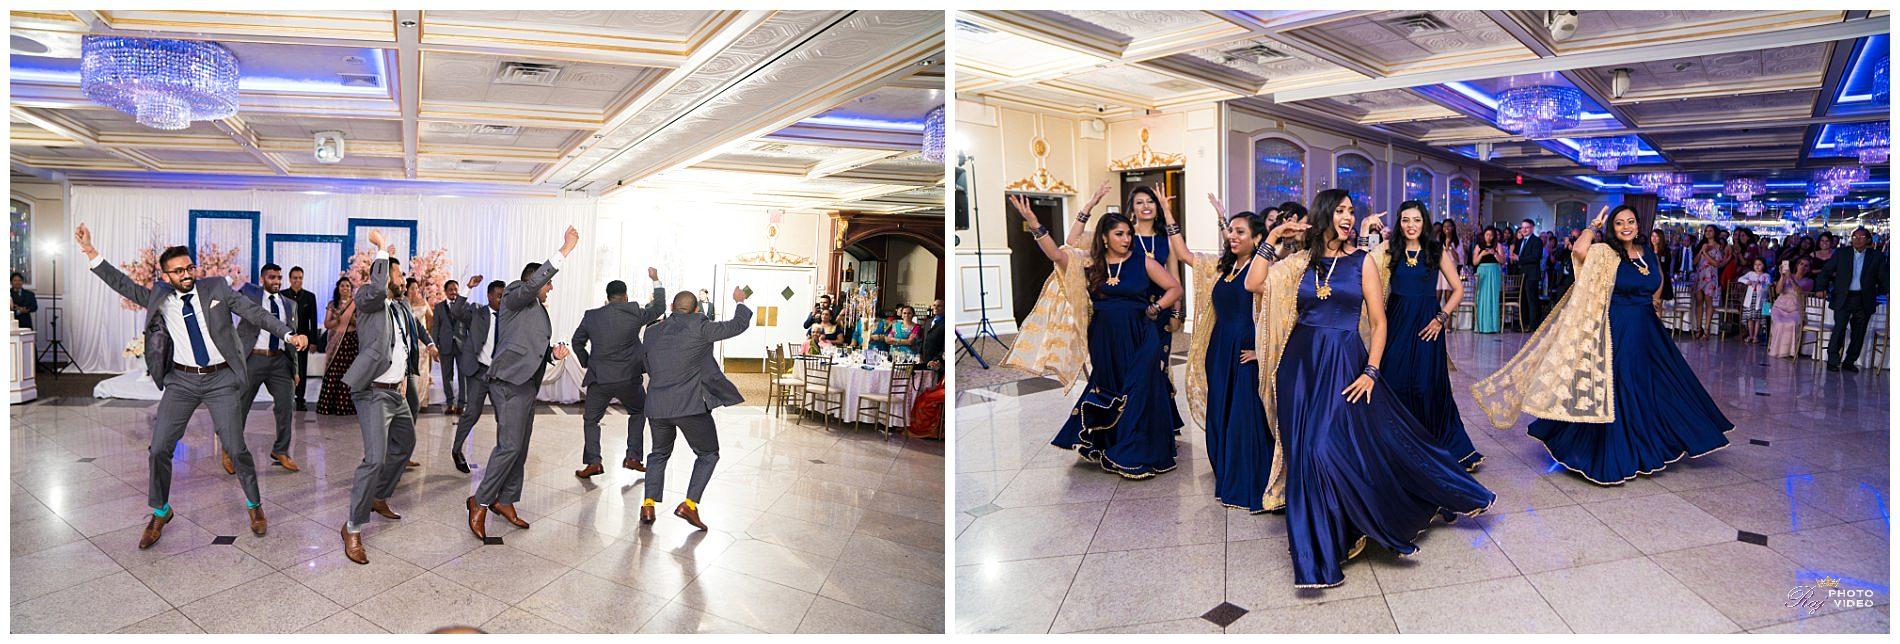 Royal-Manor-Garfield-NJ-Christian-Wedding-Ceremony-Khusbu-Jeff-62.jpg